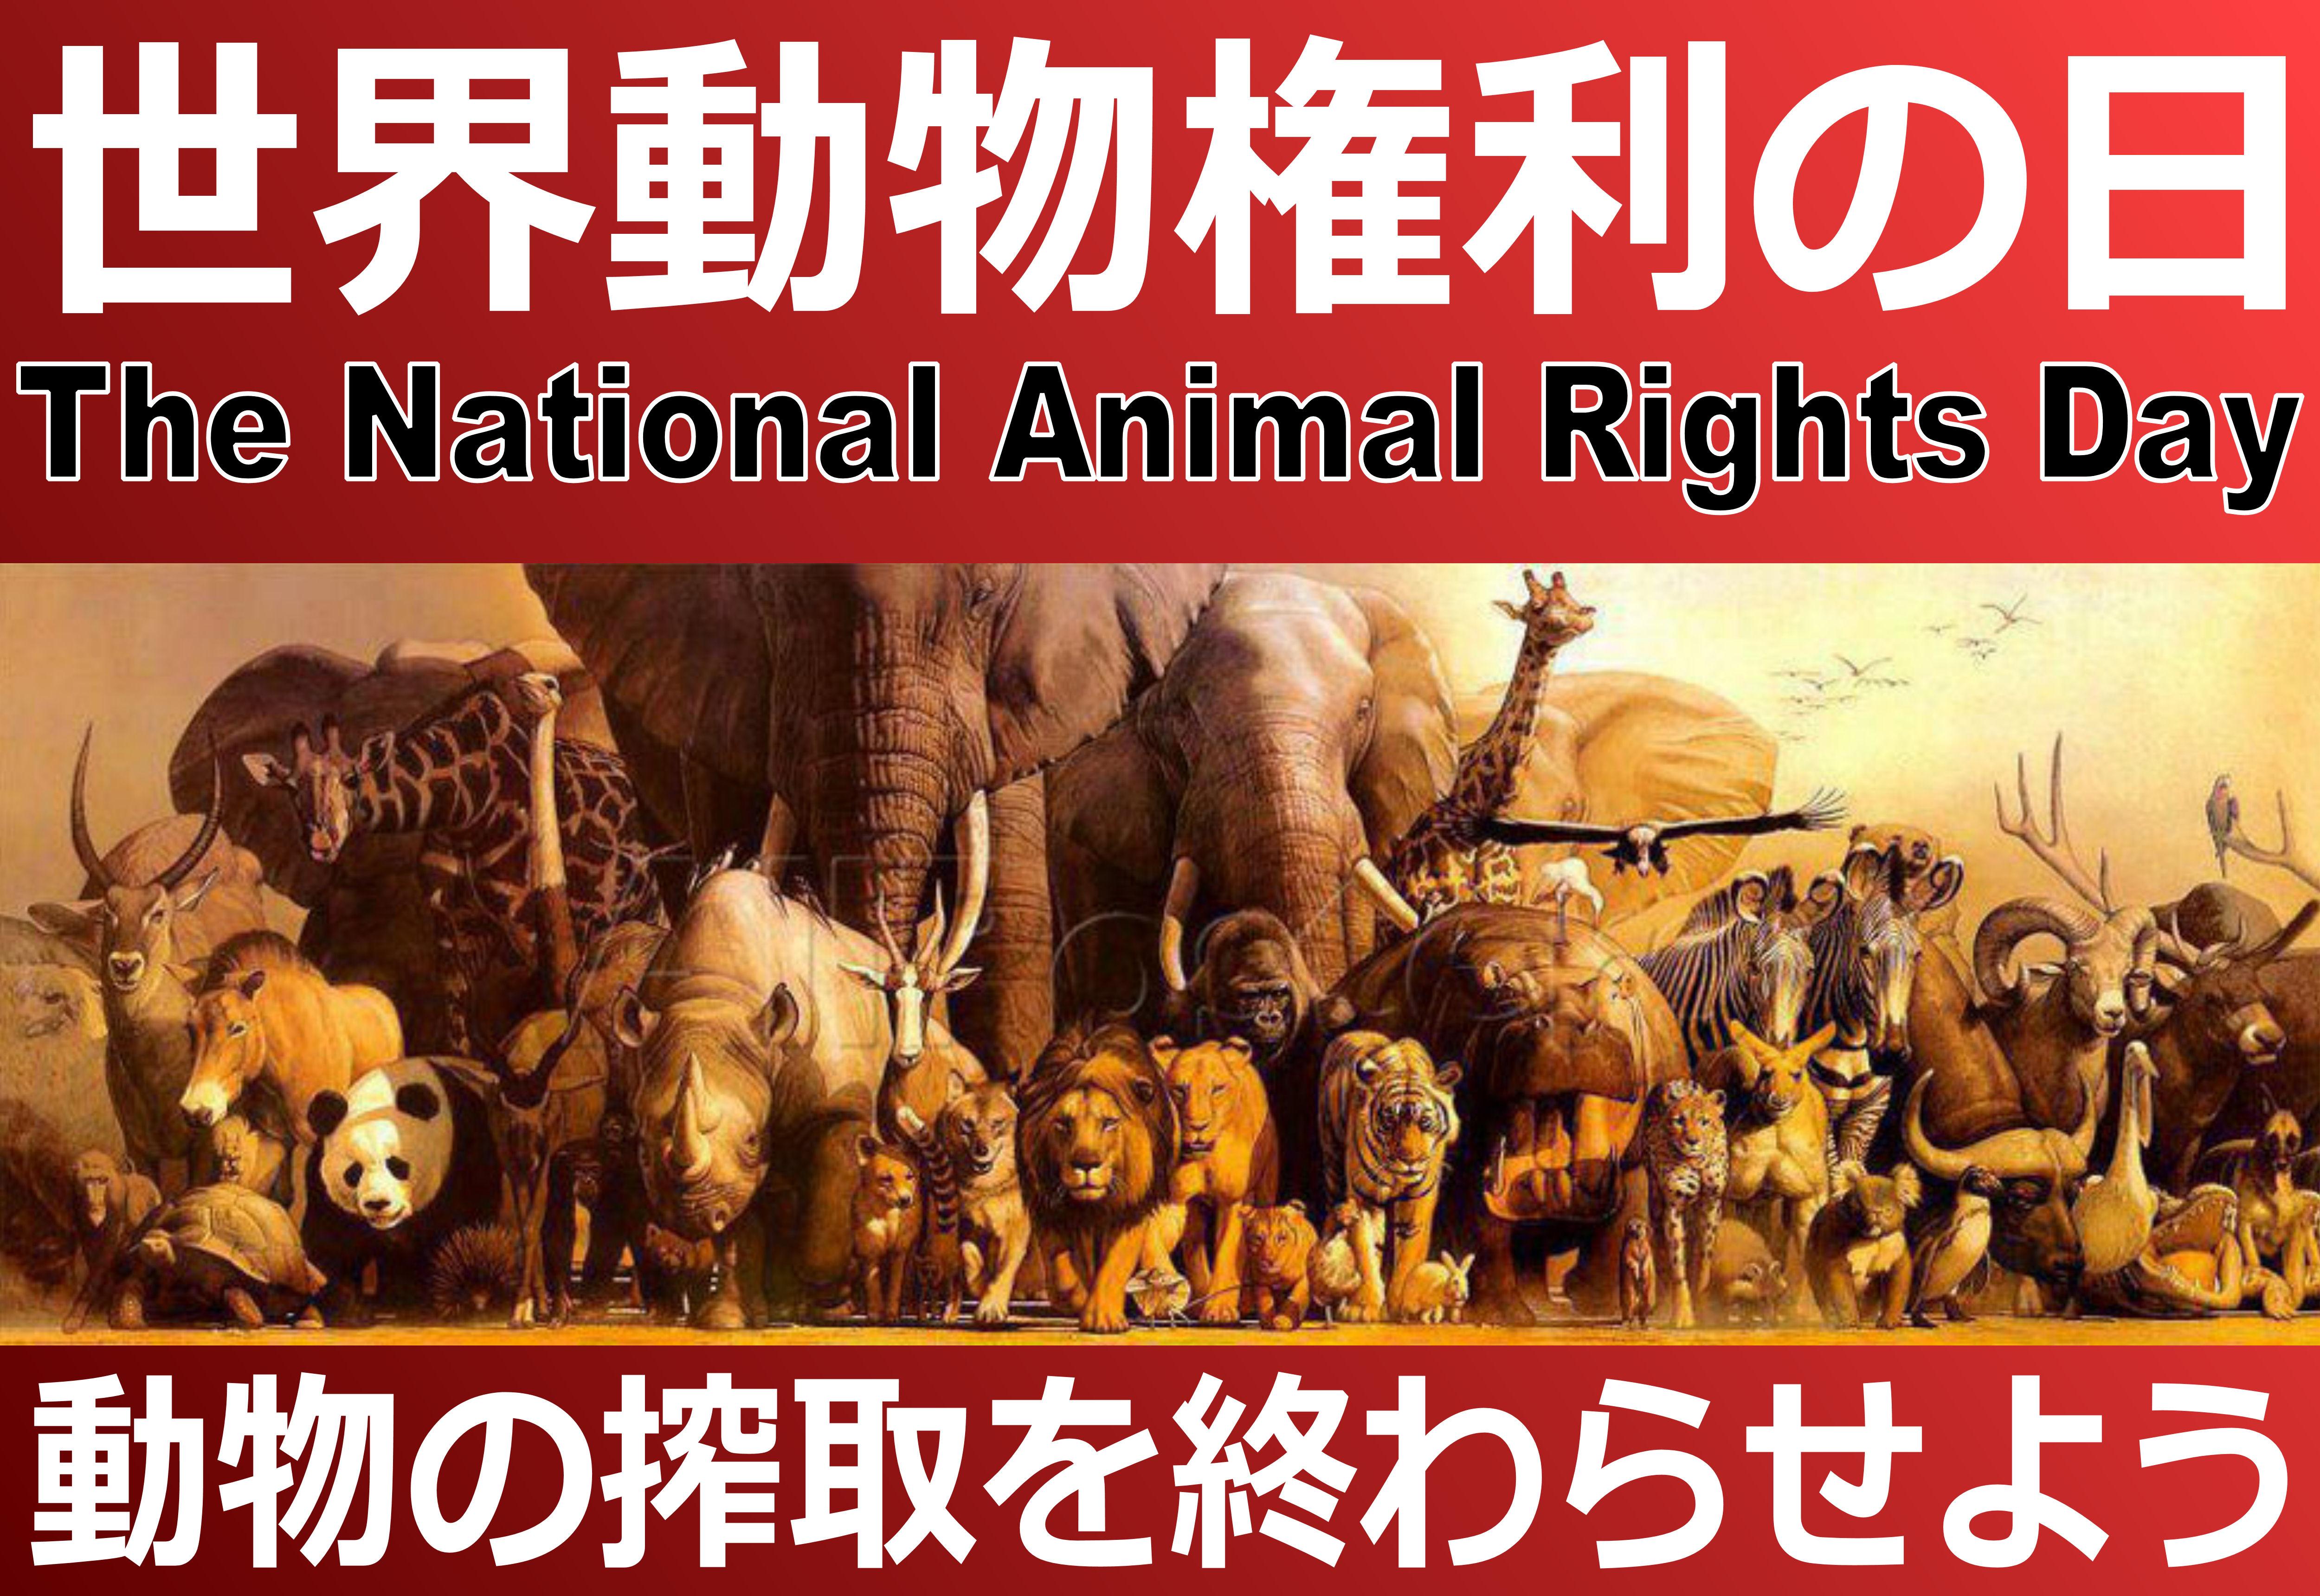 animalrightsday4.jpg